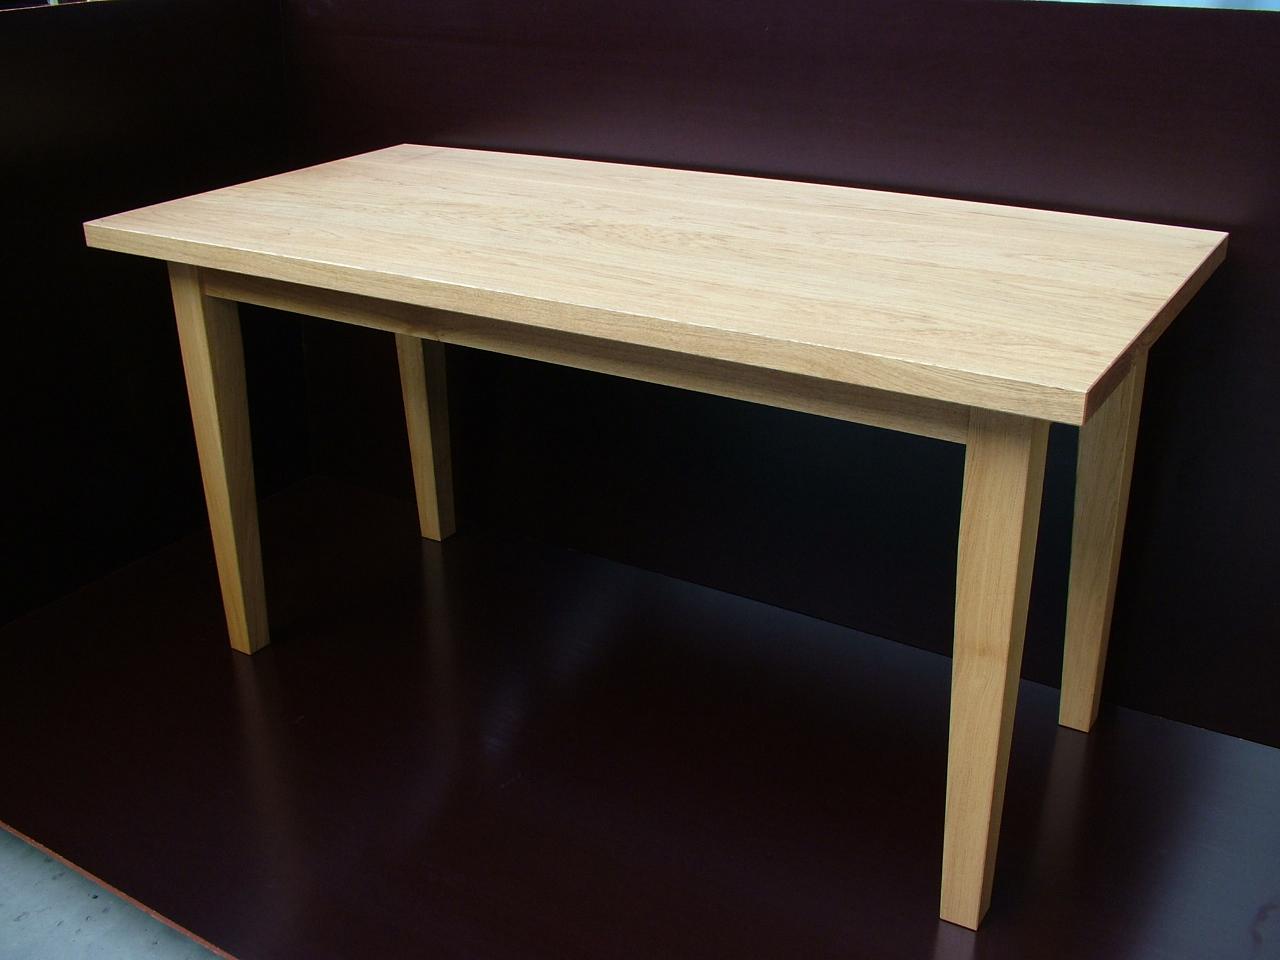 images.fordaq.com/p-17860000-17851110-D0/Tables-de-cuisine--Design--1---5-pi%C3%A8ces.JPG